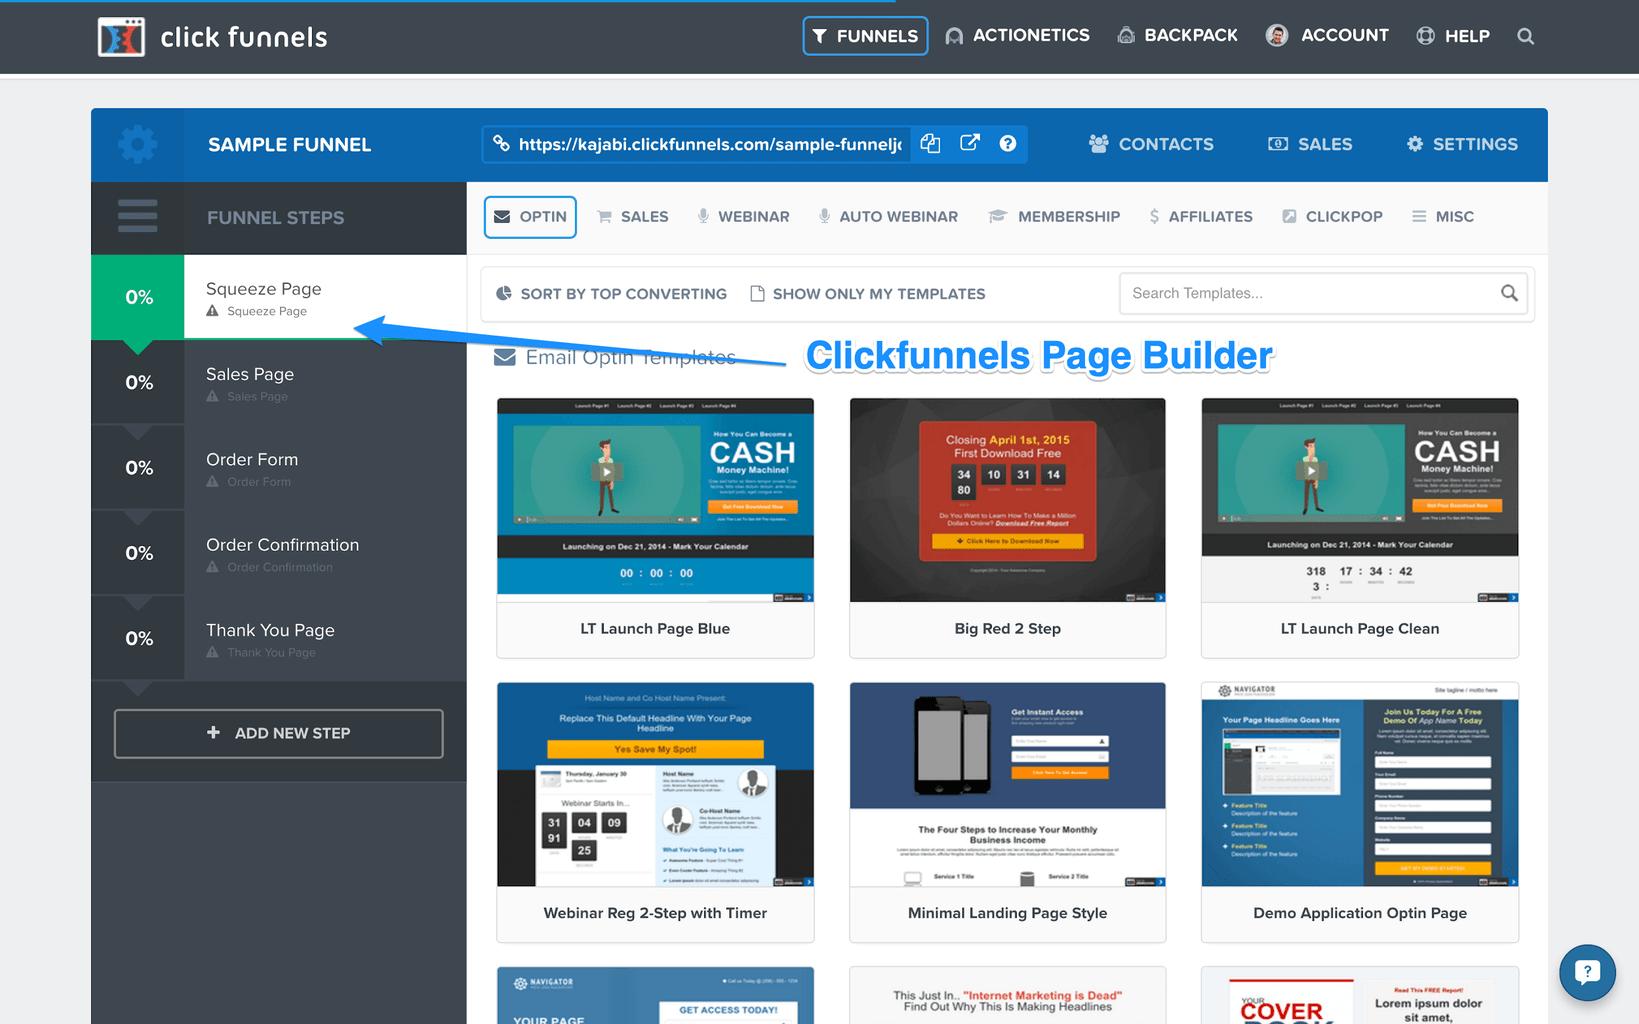 Clickfunnel page builder